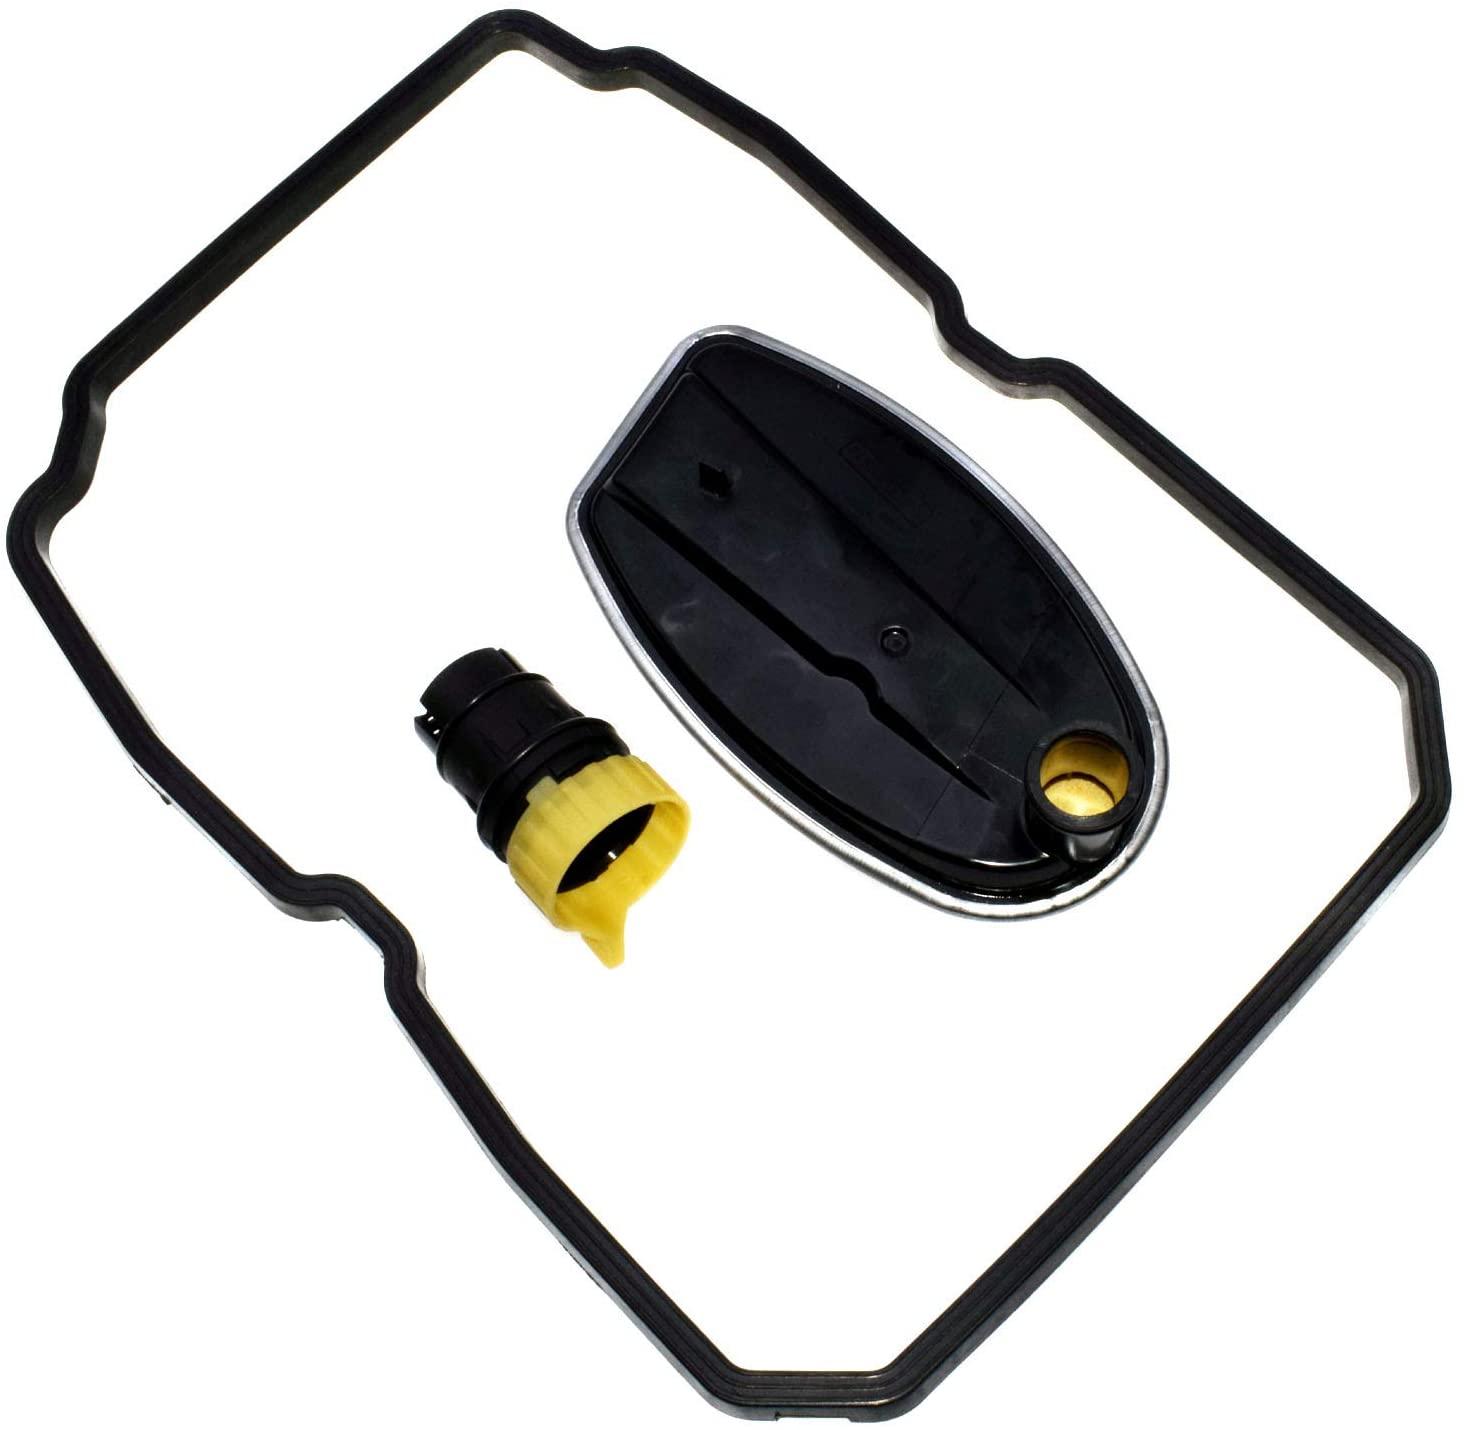 Transmission Filter Kit with Pin Connector 1402710080 1402770095 2035400253 NEW FOR Mercedes-Benz Sprinter 2500 Sprinter 3500 G55 AMG CL600 E350 C350 Dodge Sprinter 3500 Sprinter 2500 2005-2012